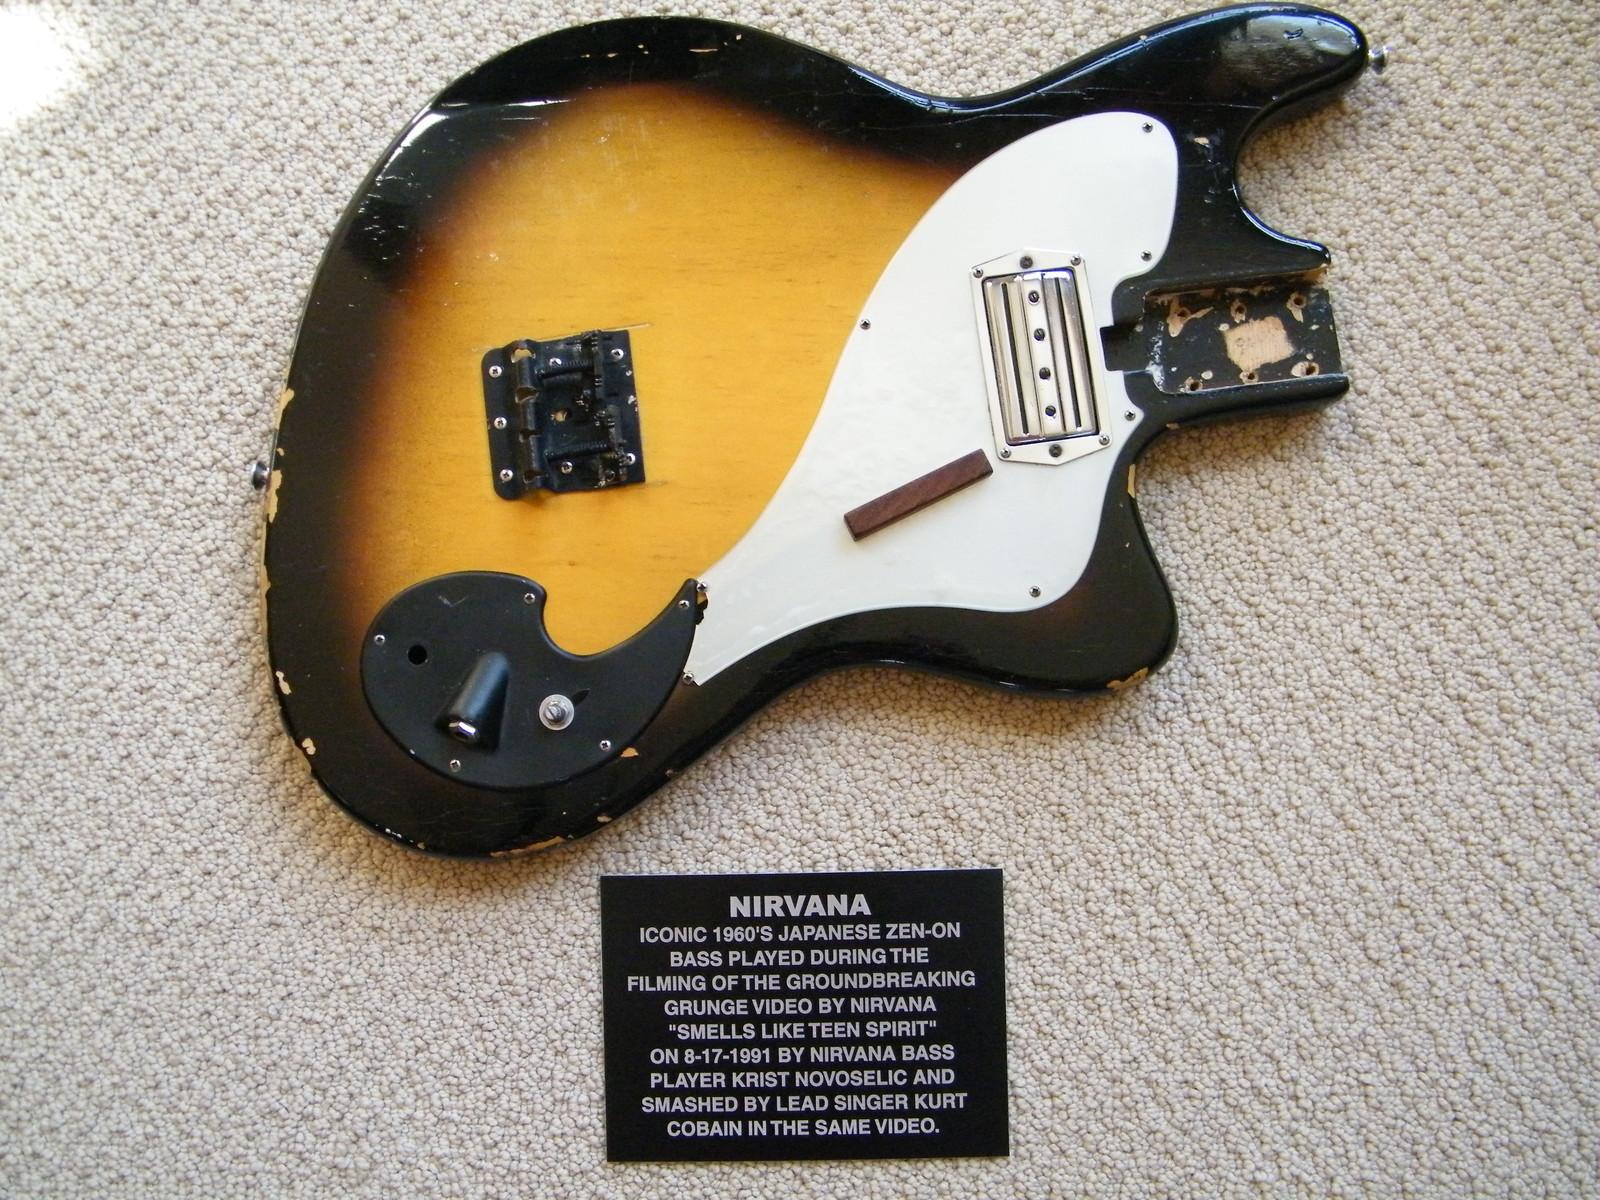 Гитара из легендарного клипа Nirvana ищет хозяина